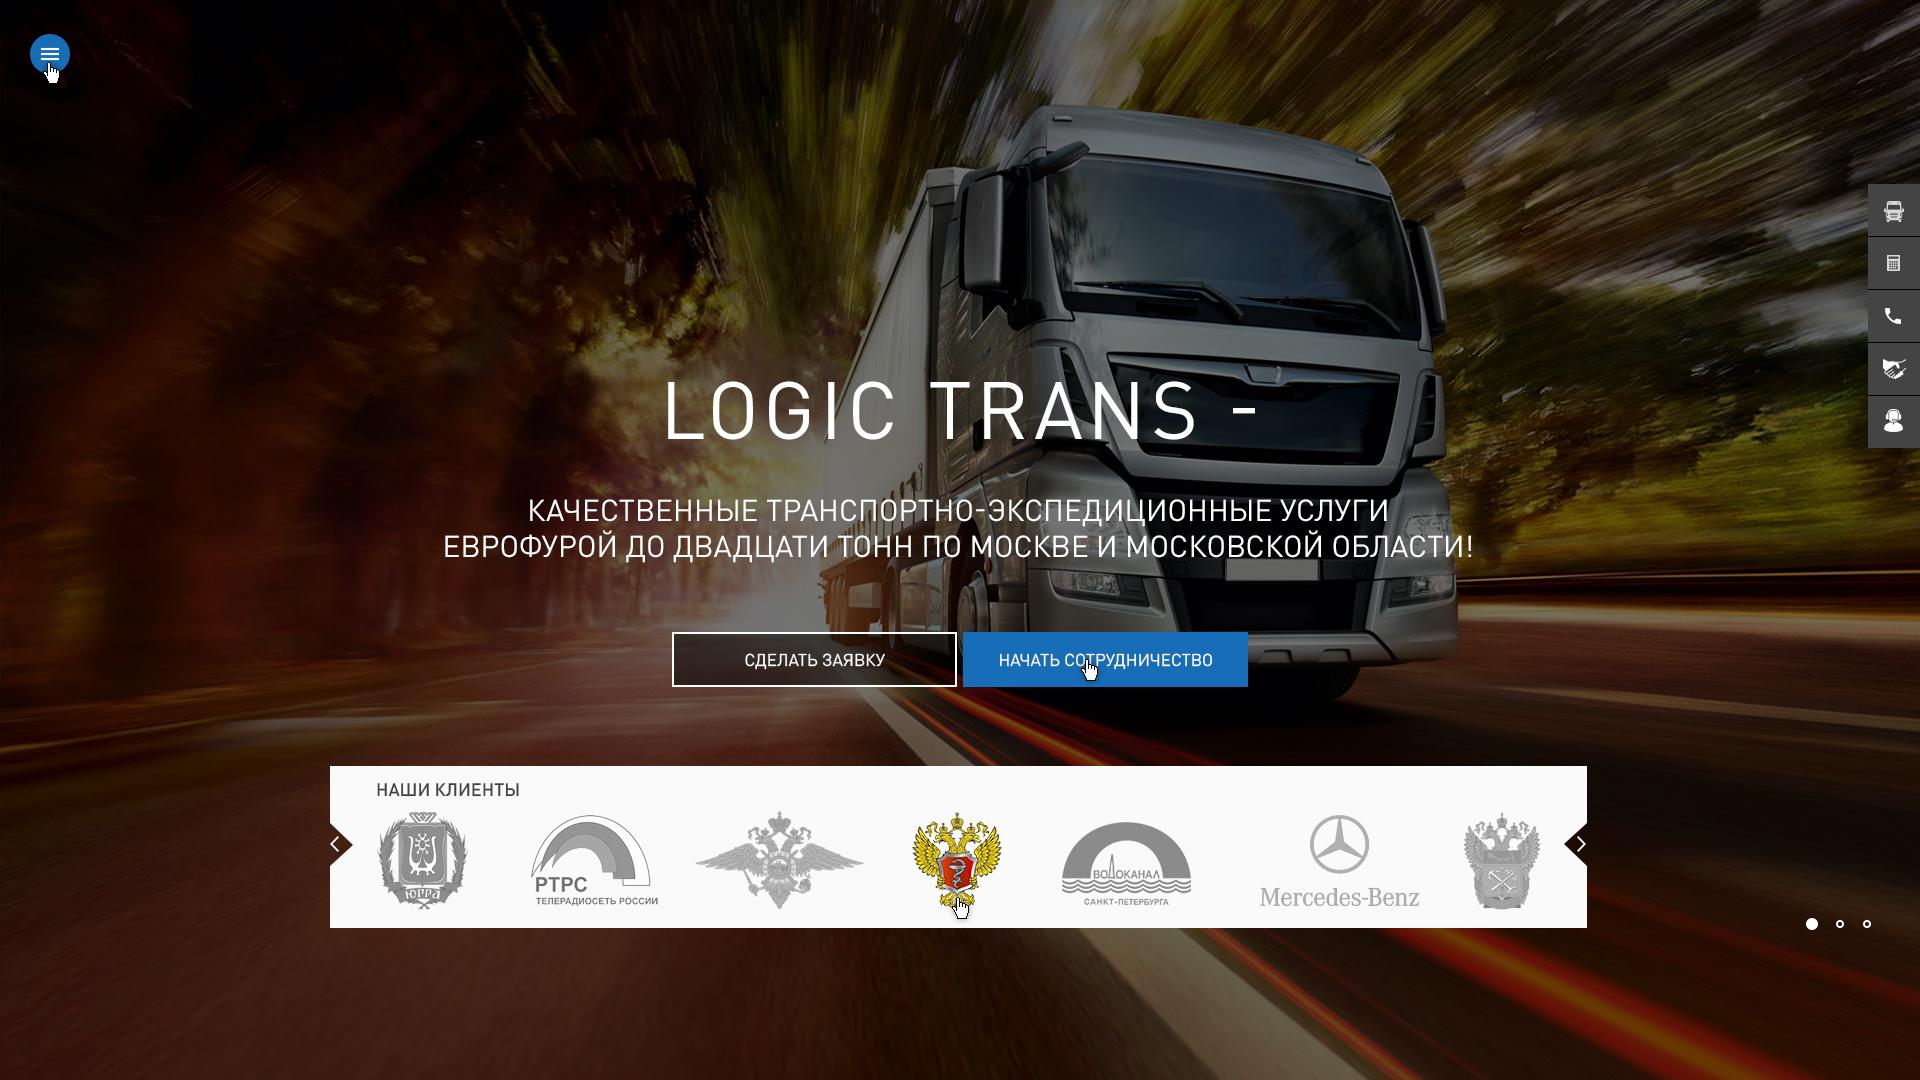 Дизайн сайта транспортно-экспедиторской компании ЛогикТранс фото f_7135a45bed1bdd87.jpg